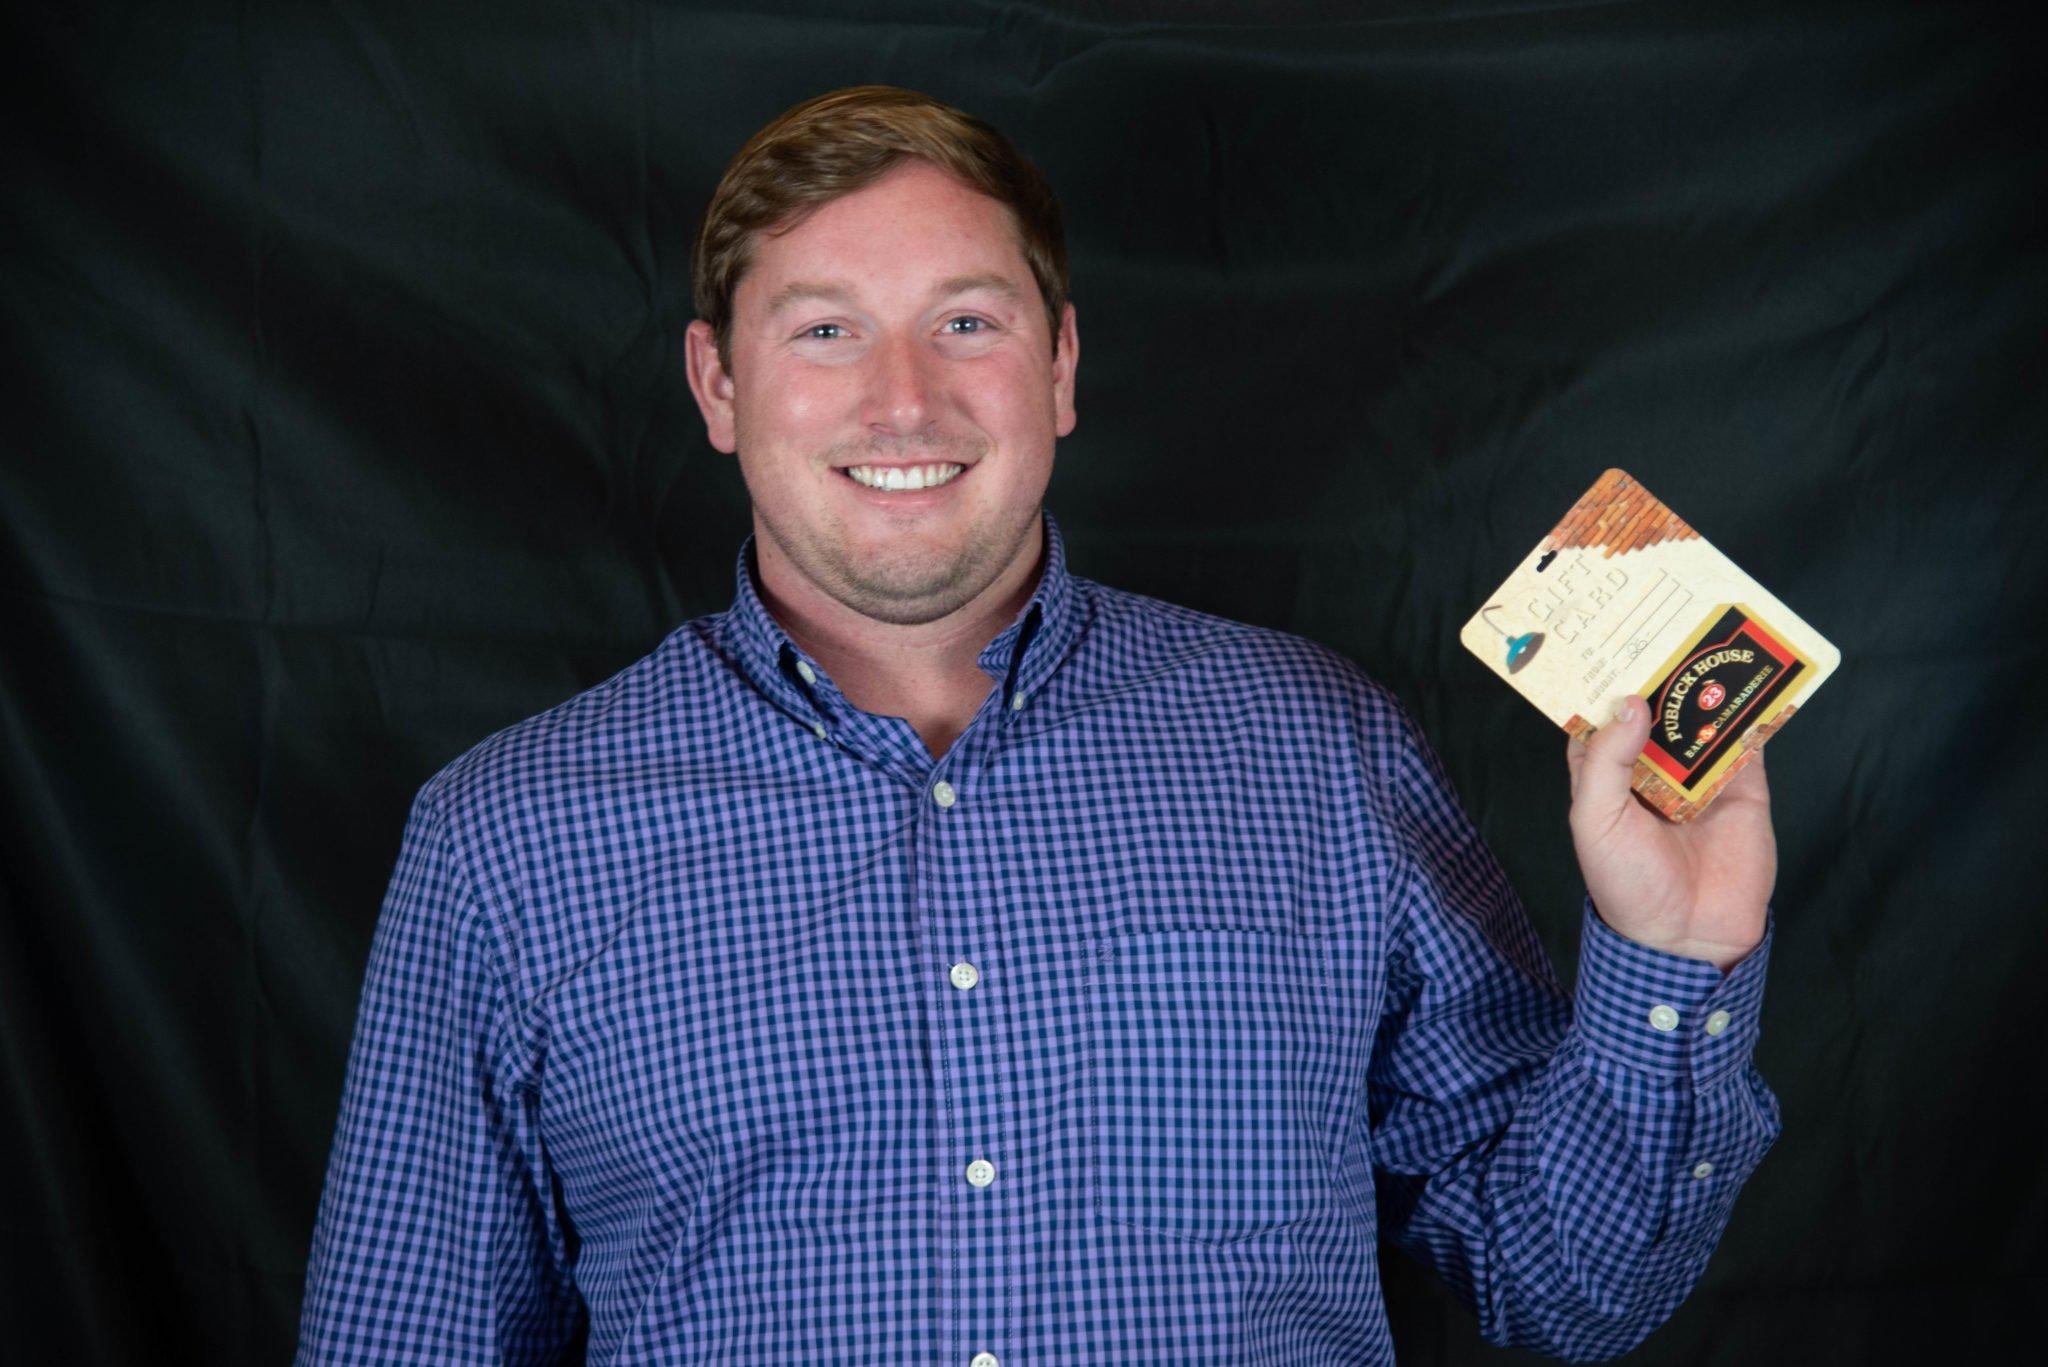 Luke Posing with Prize